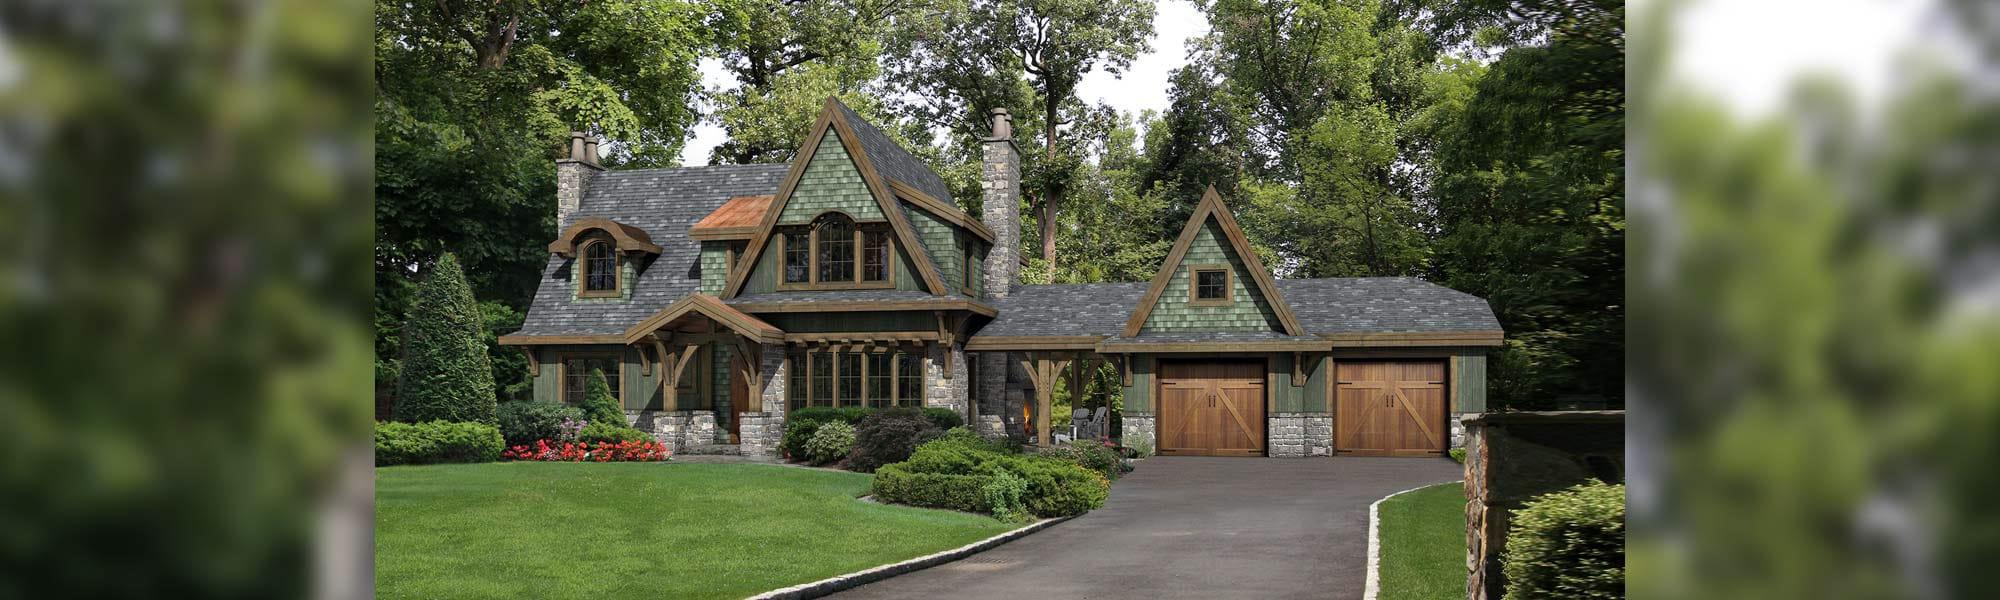 Foxwood tudor timber home floor plan